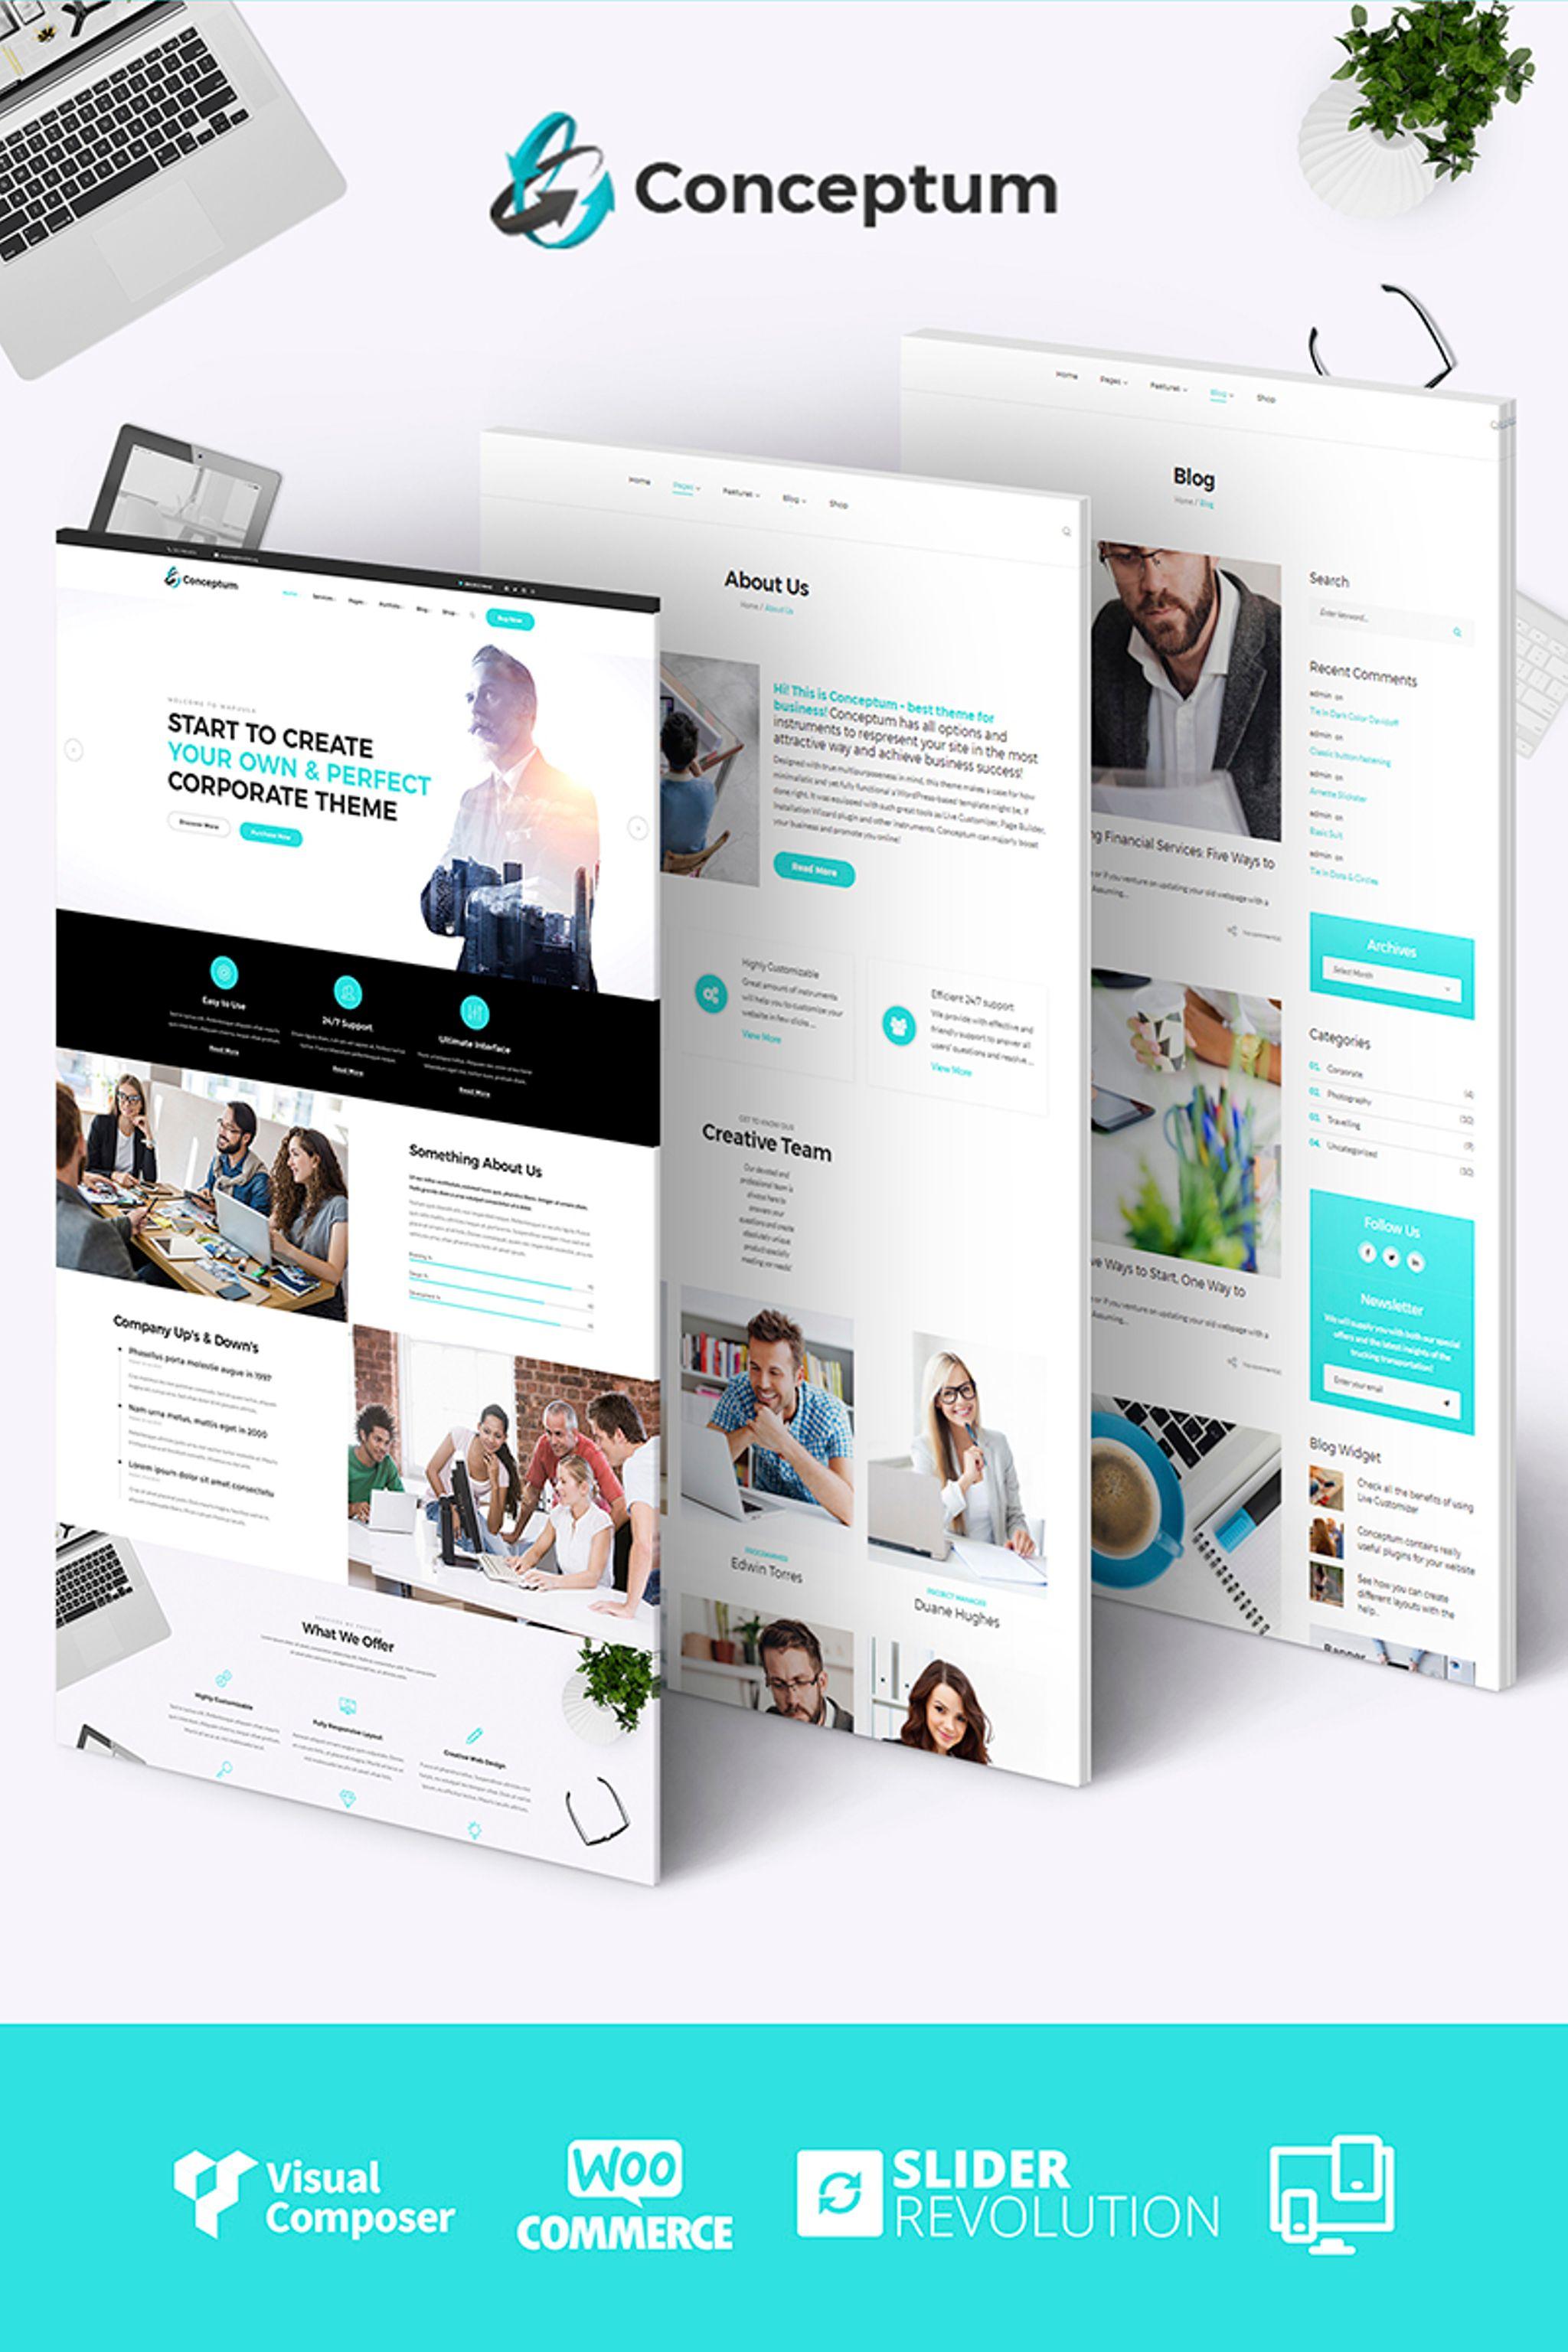 Conceptum - Corporate Responsive WordPress sablon 65934 - képernyőkép